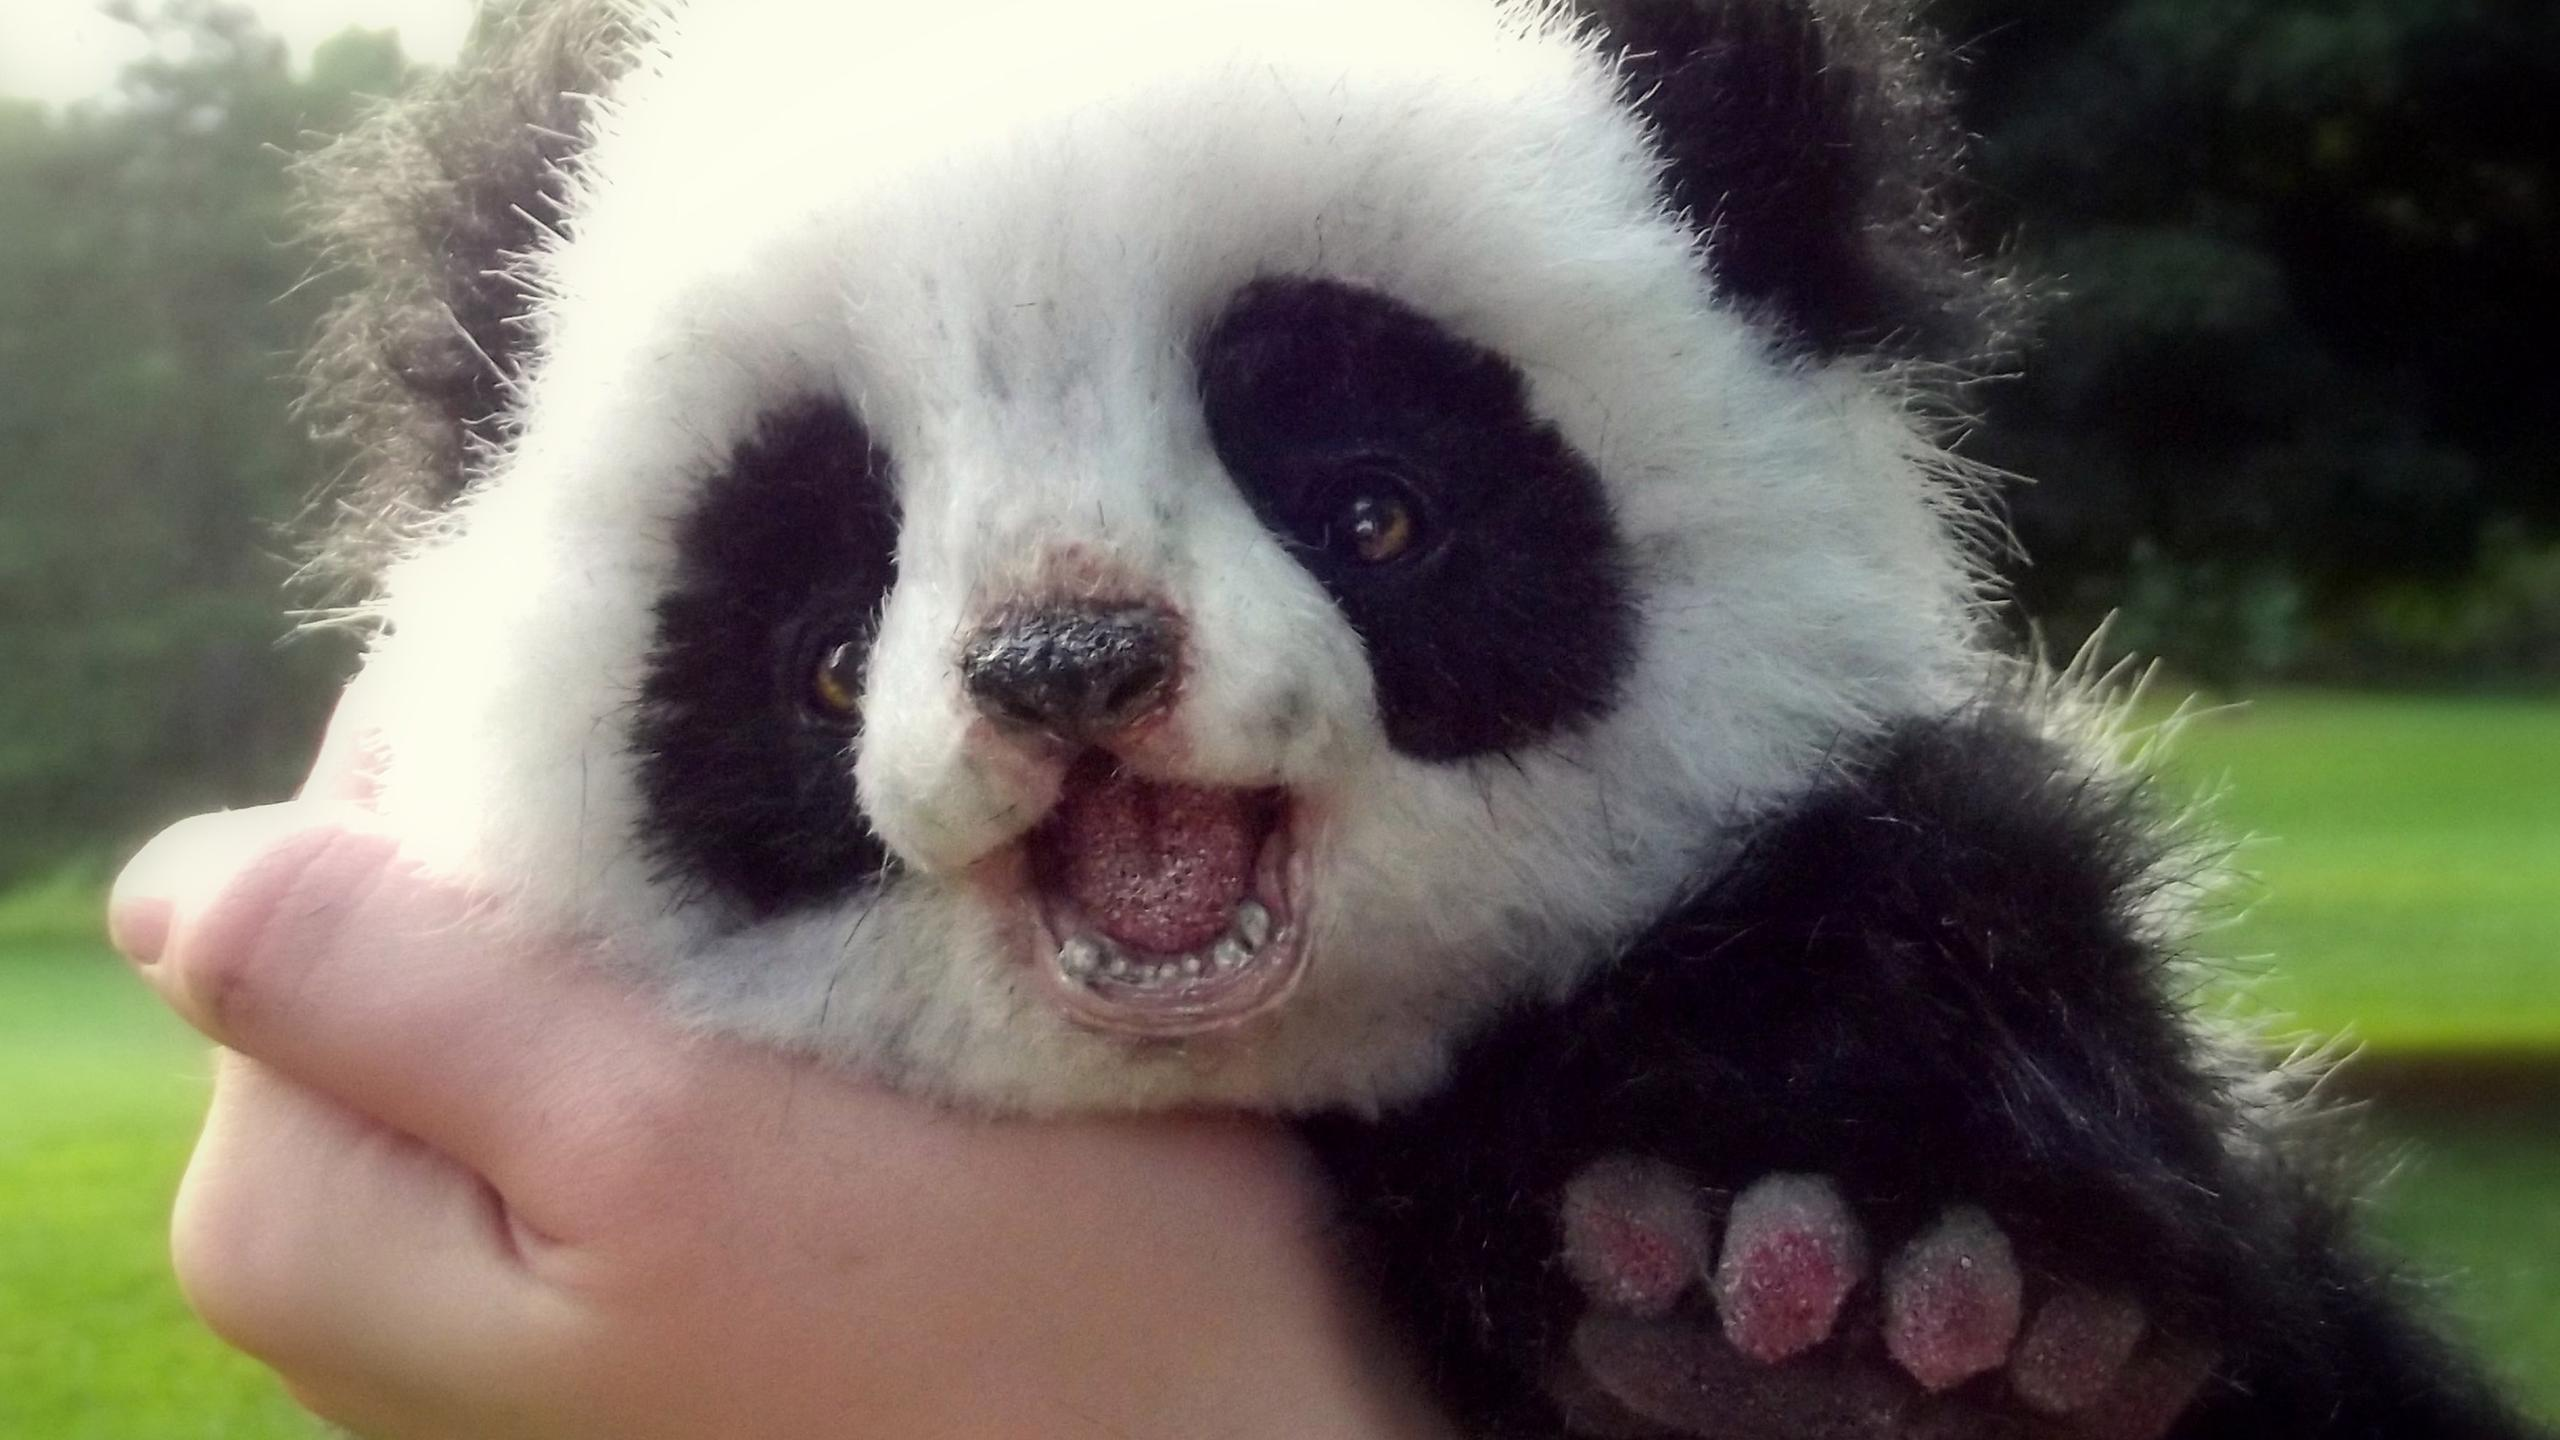 Cute White Dogs Wallpapers Cute Panda Bear Cub Wild Animals Wallpaper Wallpaper